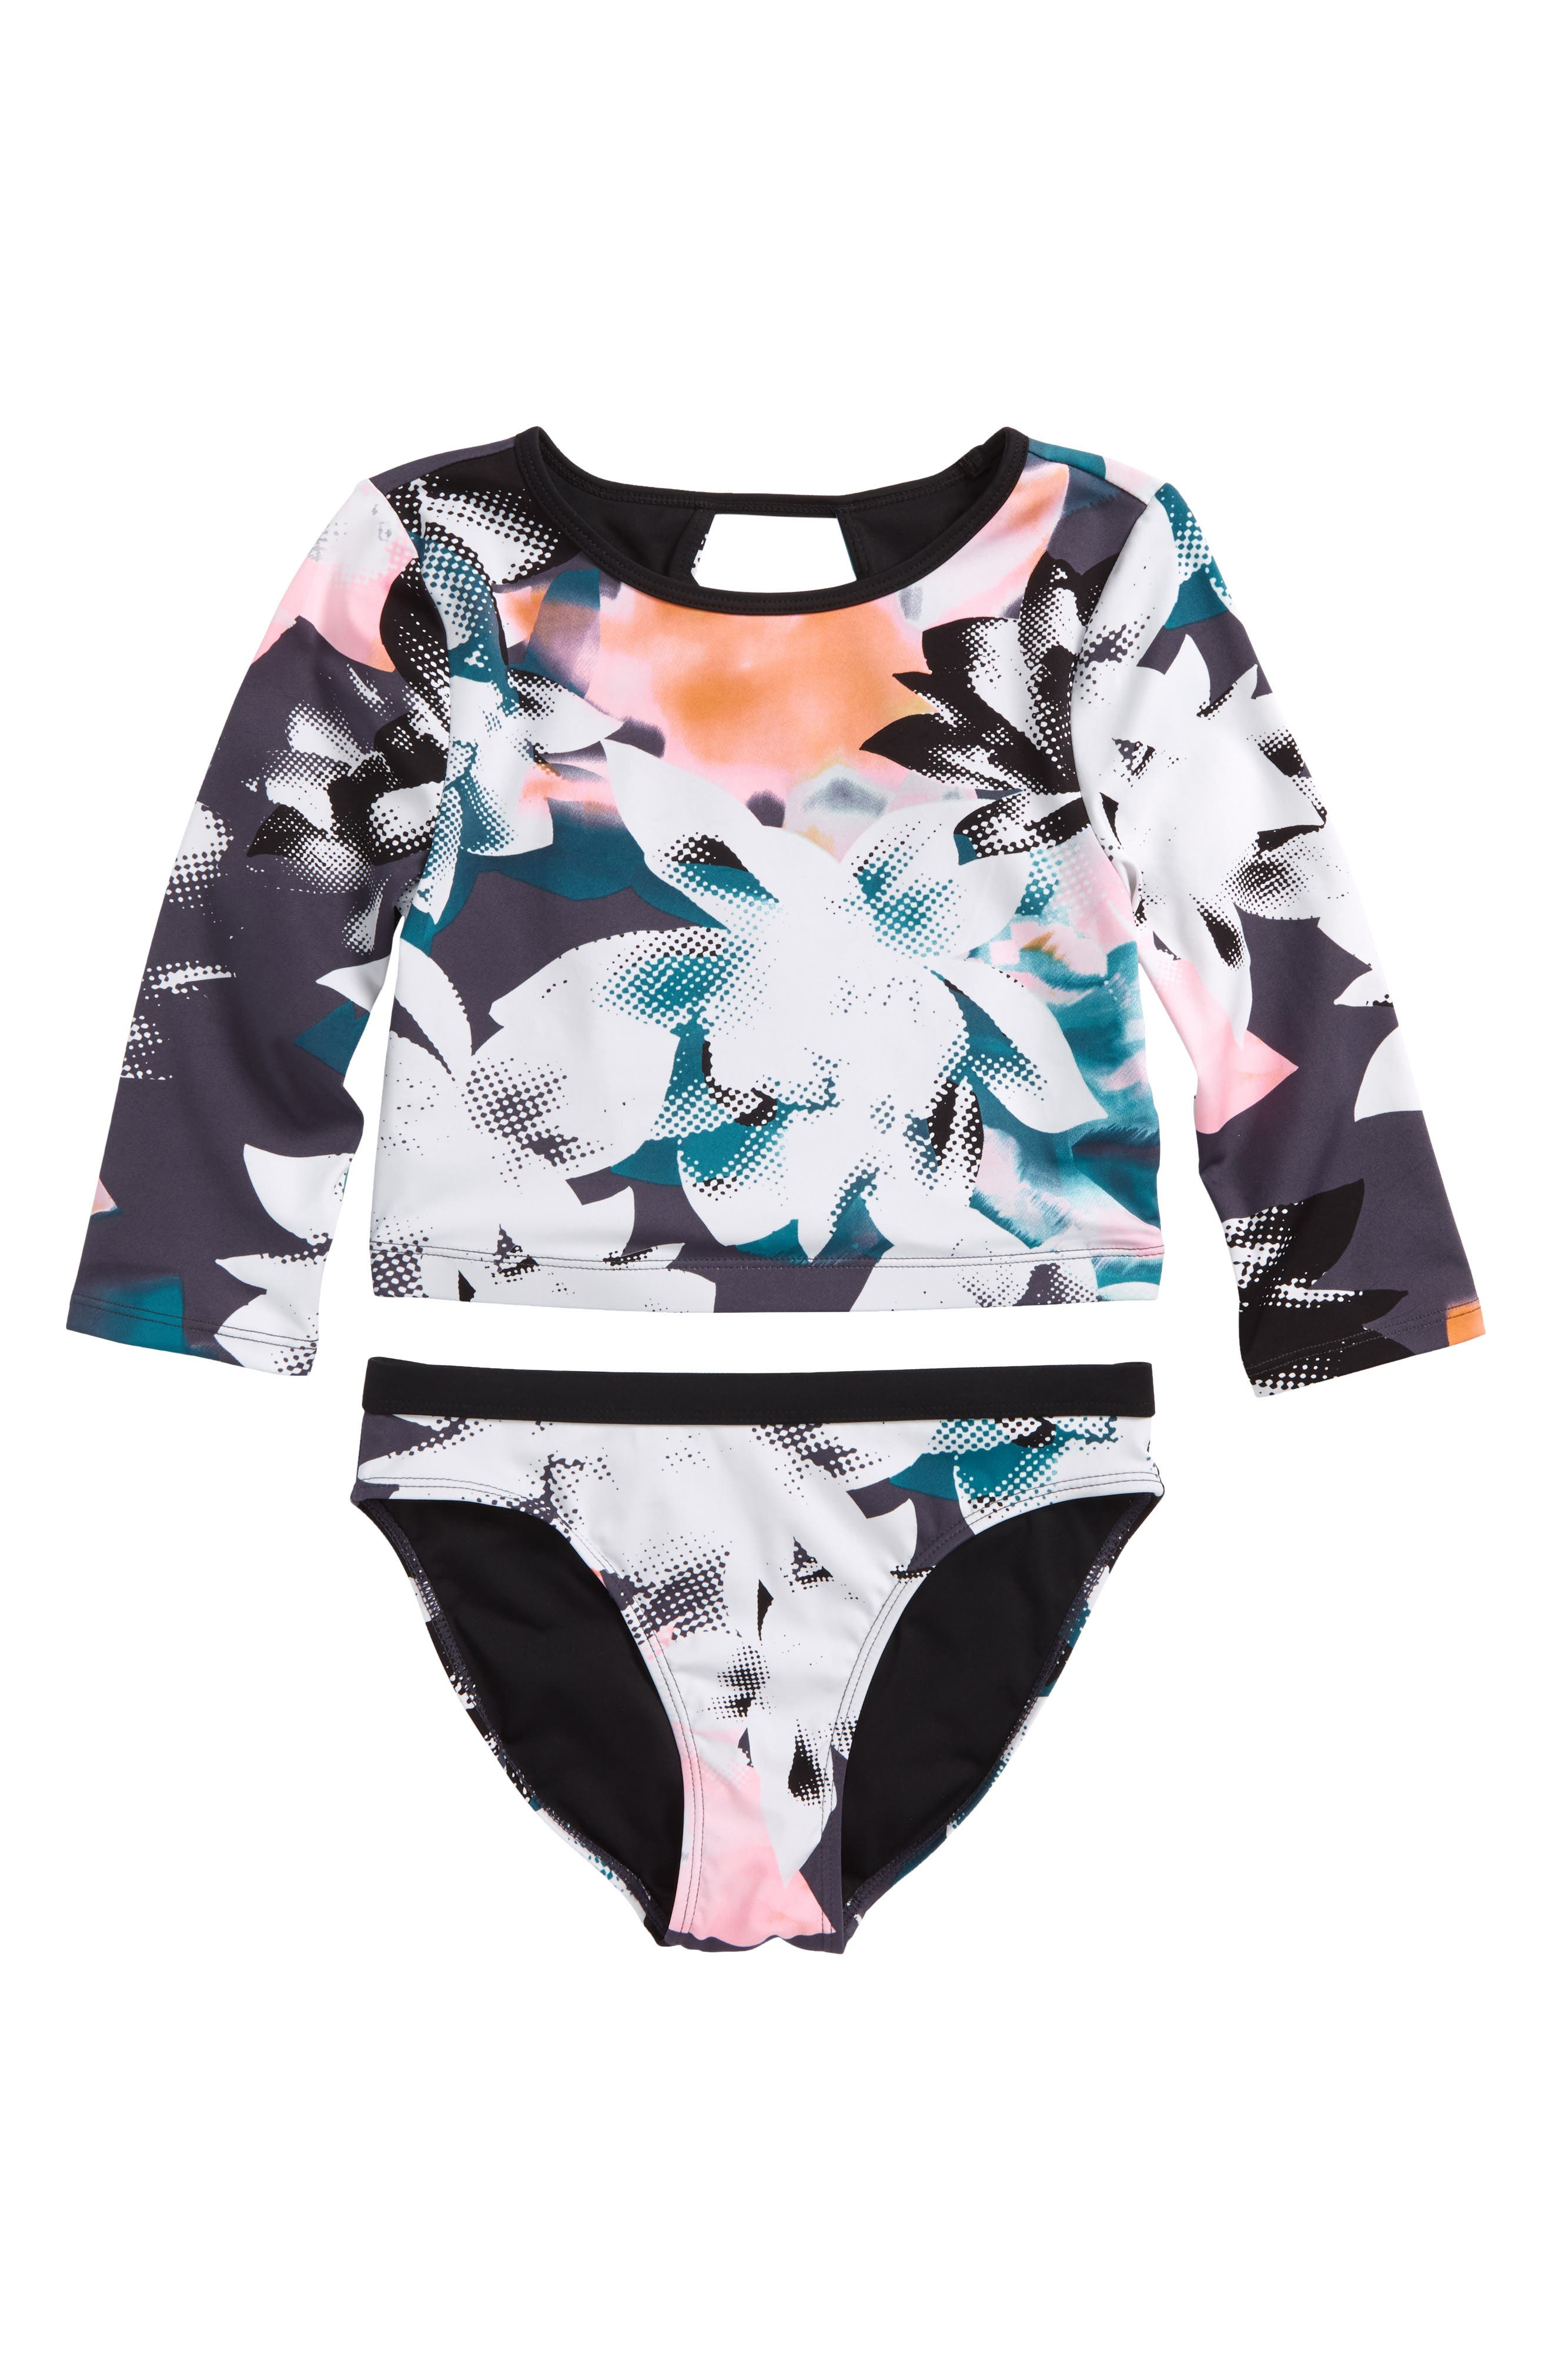 ZELLA GIRL Scoop Two-Piece Rashguard Swimsuit, Main, color, 001